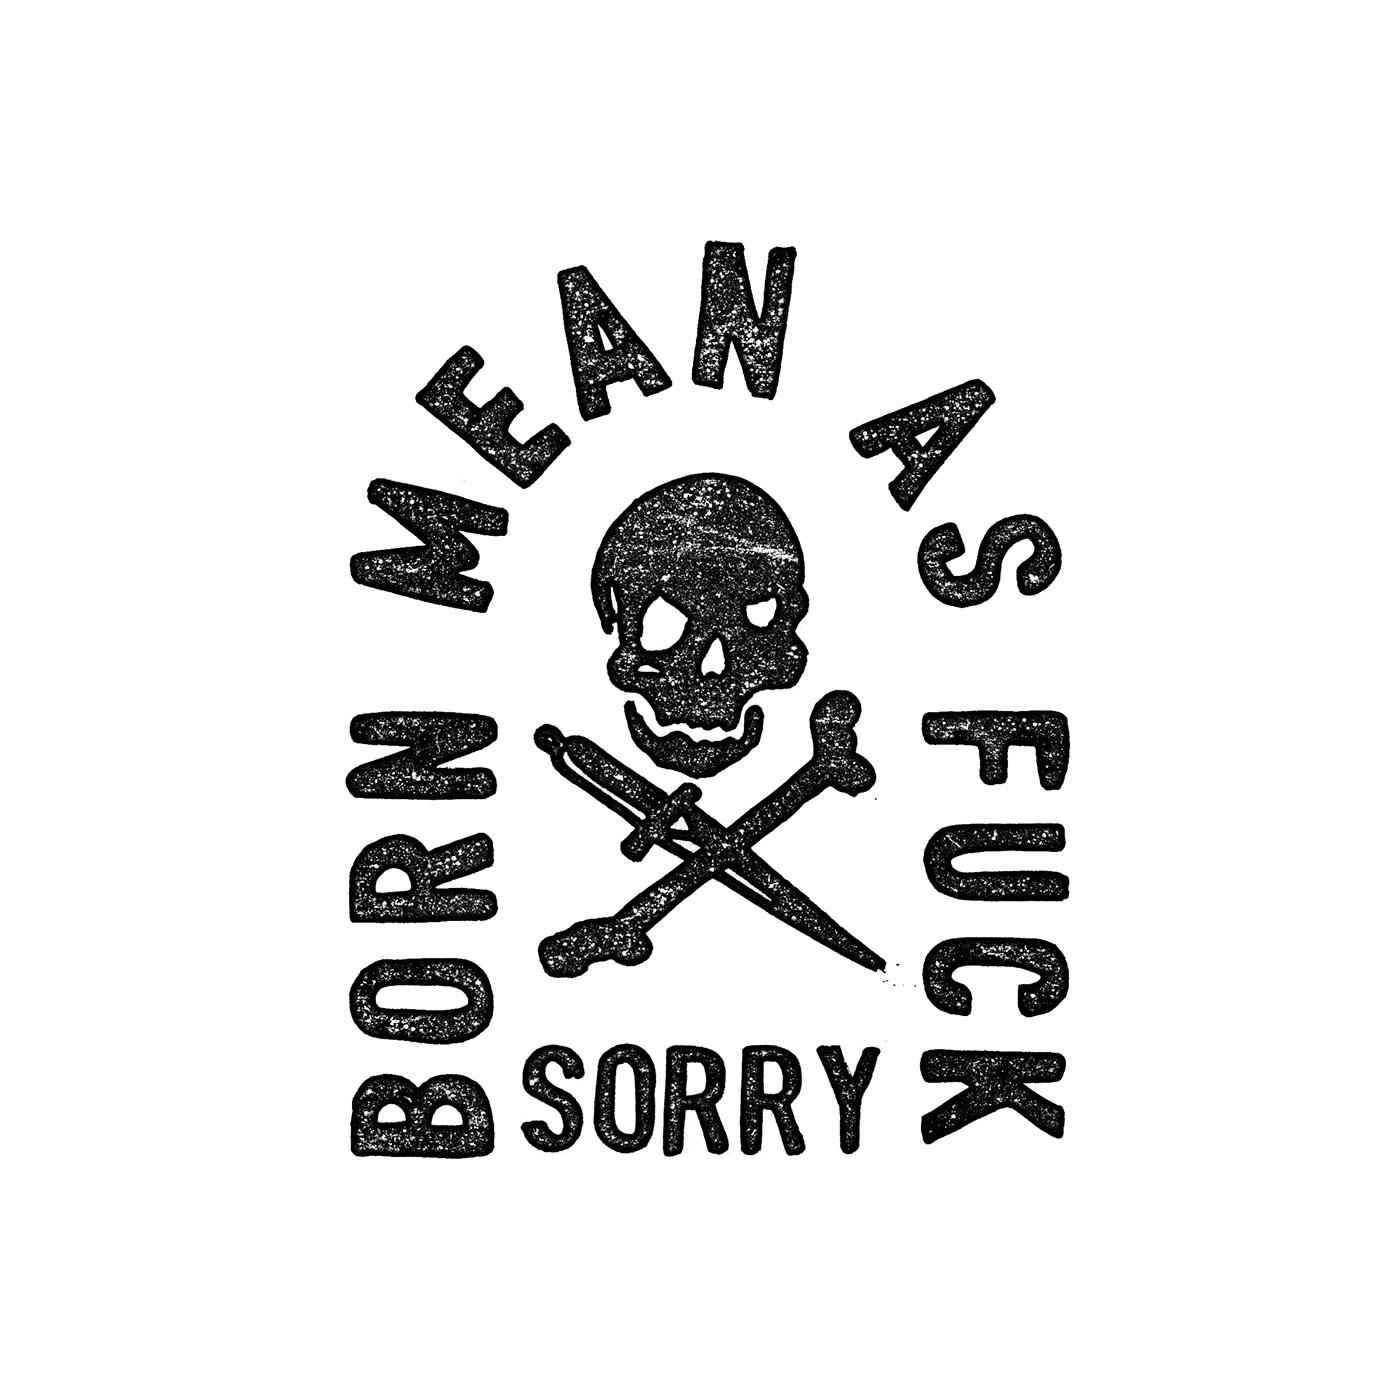 black Work  typography   slogan message ironic sarcastic graphic design  logo t-shirt